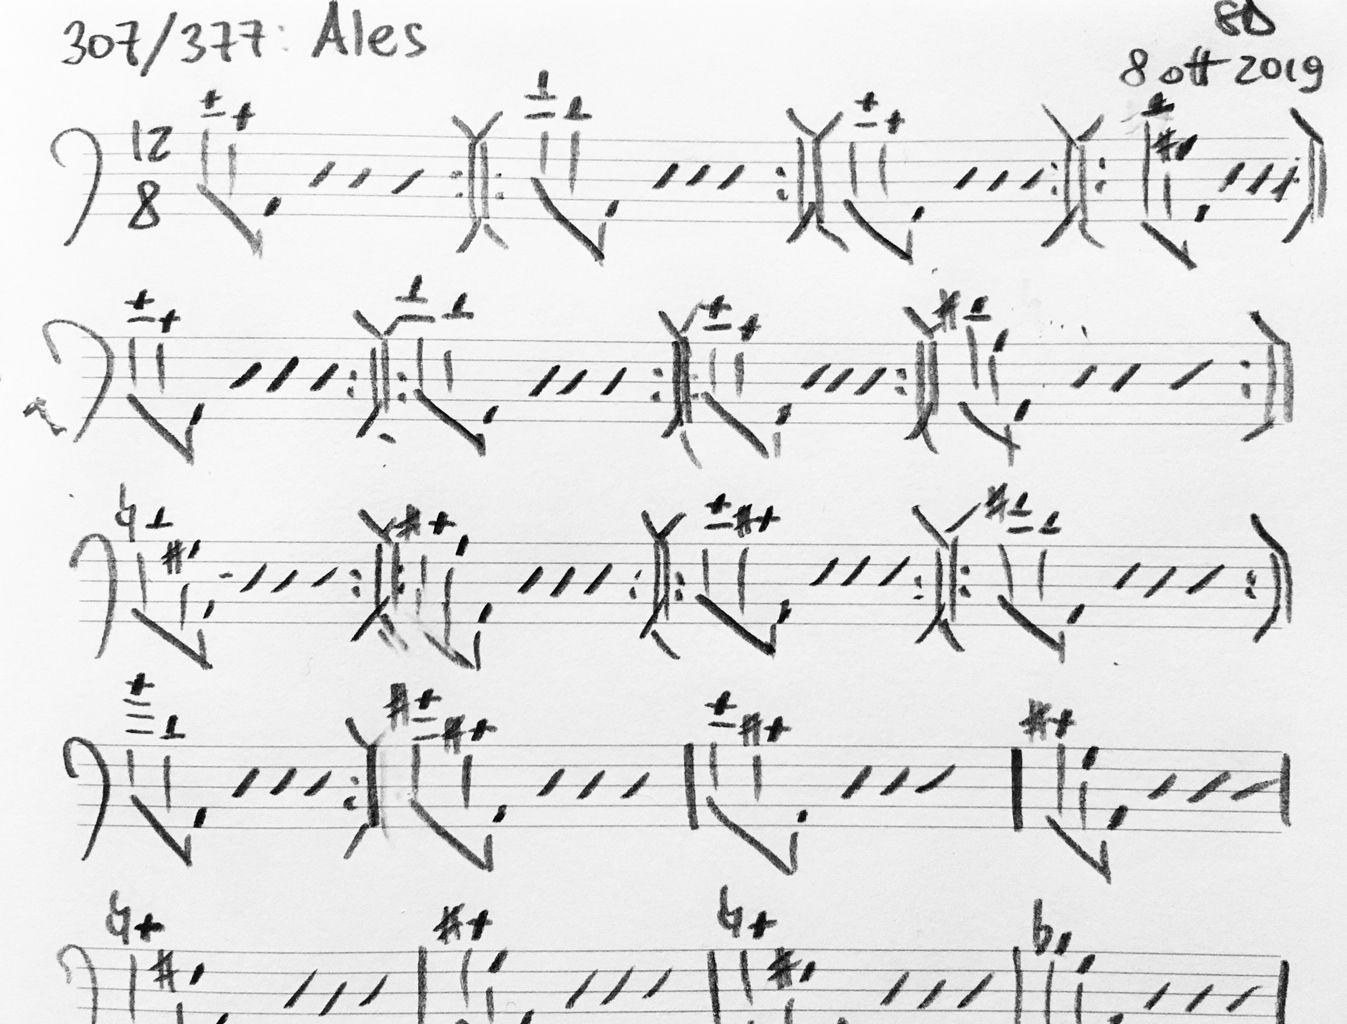 307-Ales-score